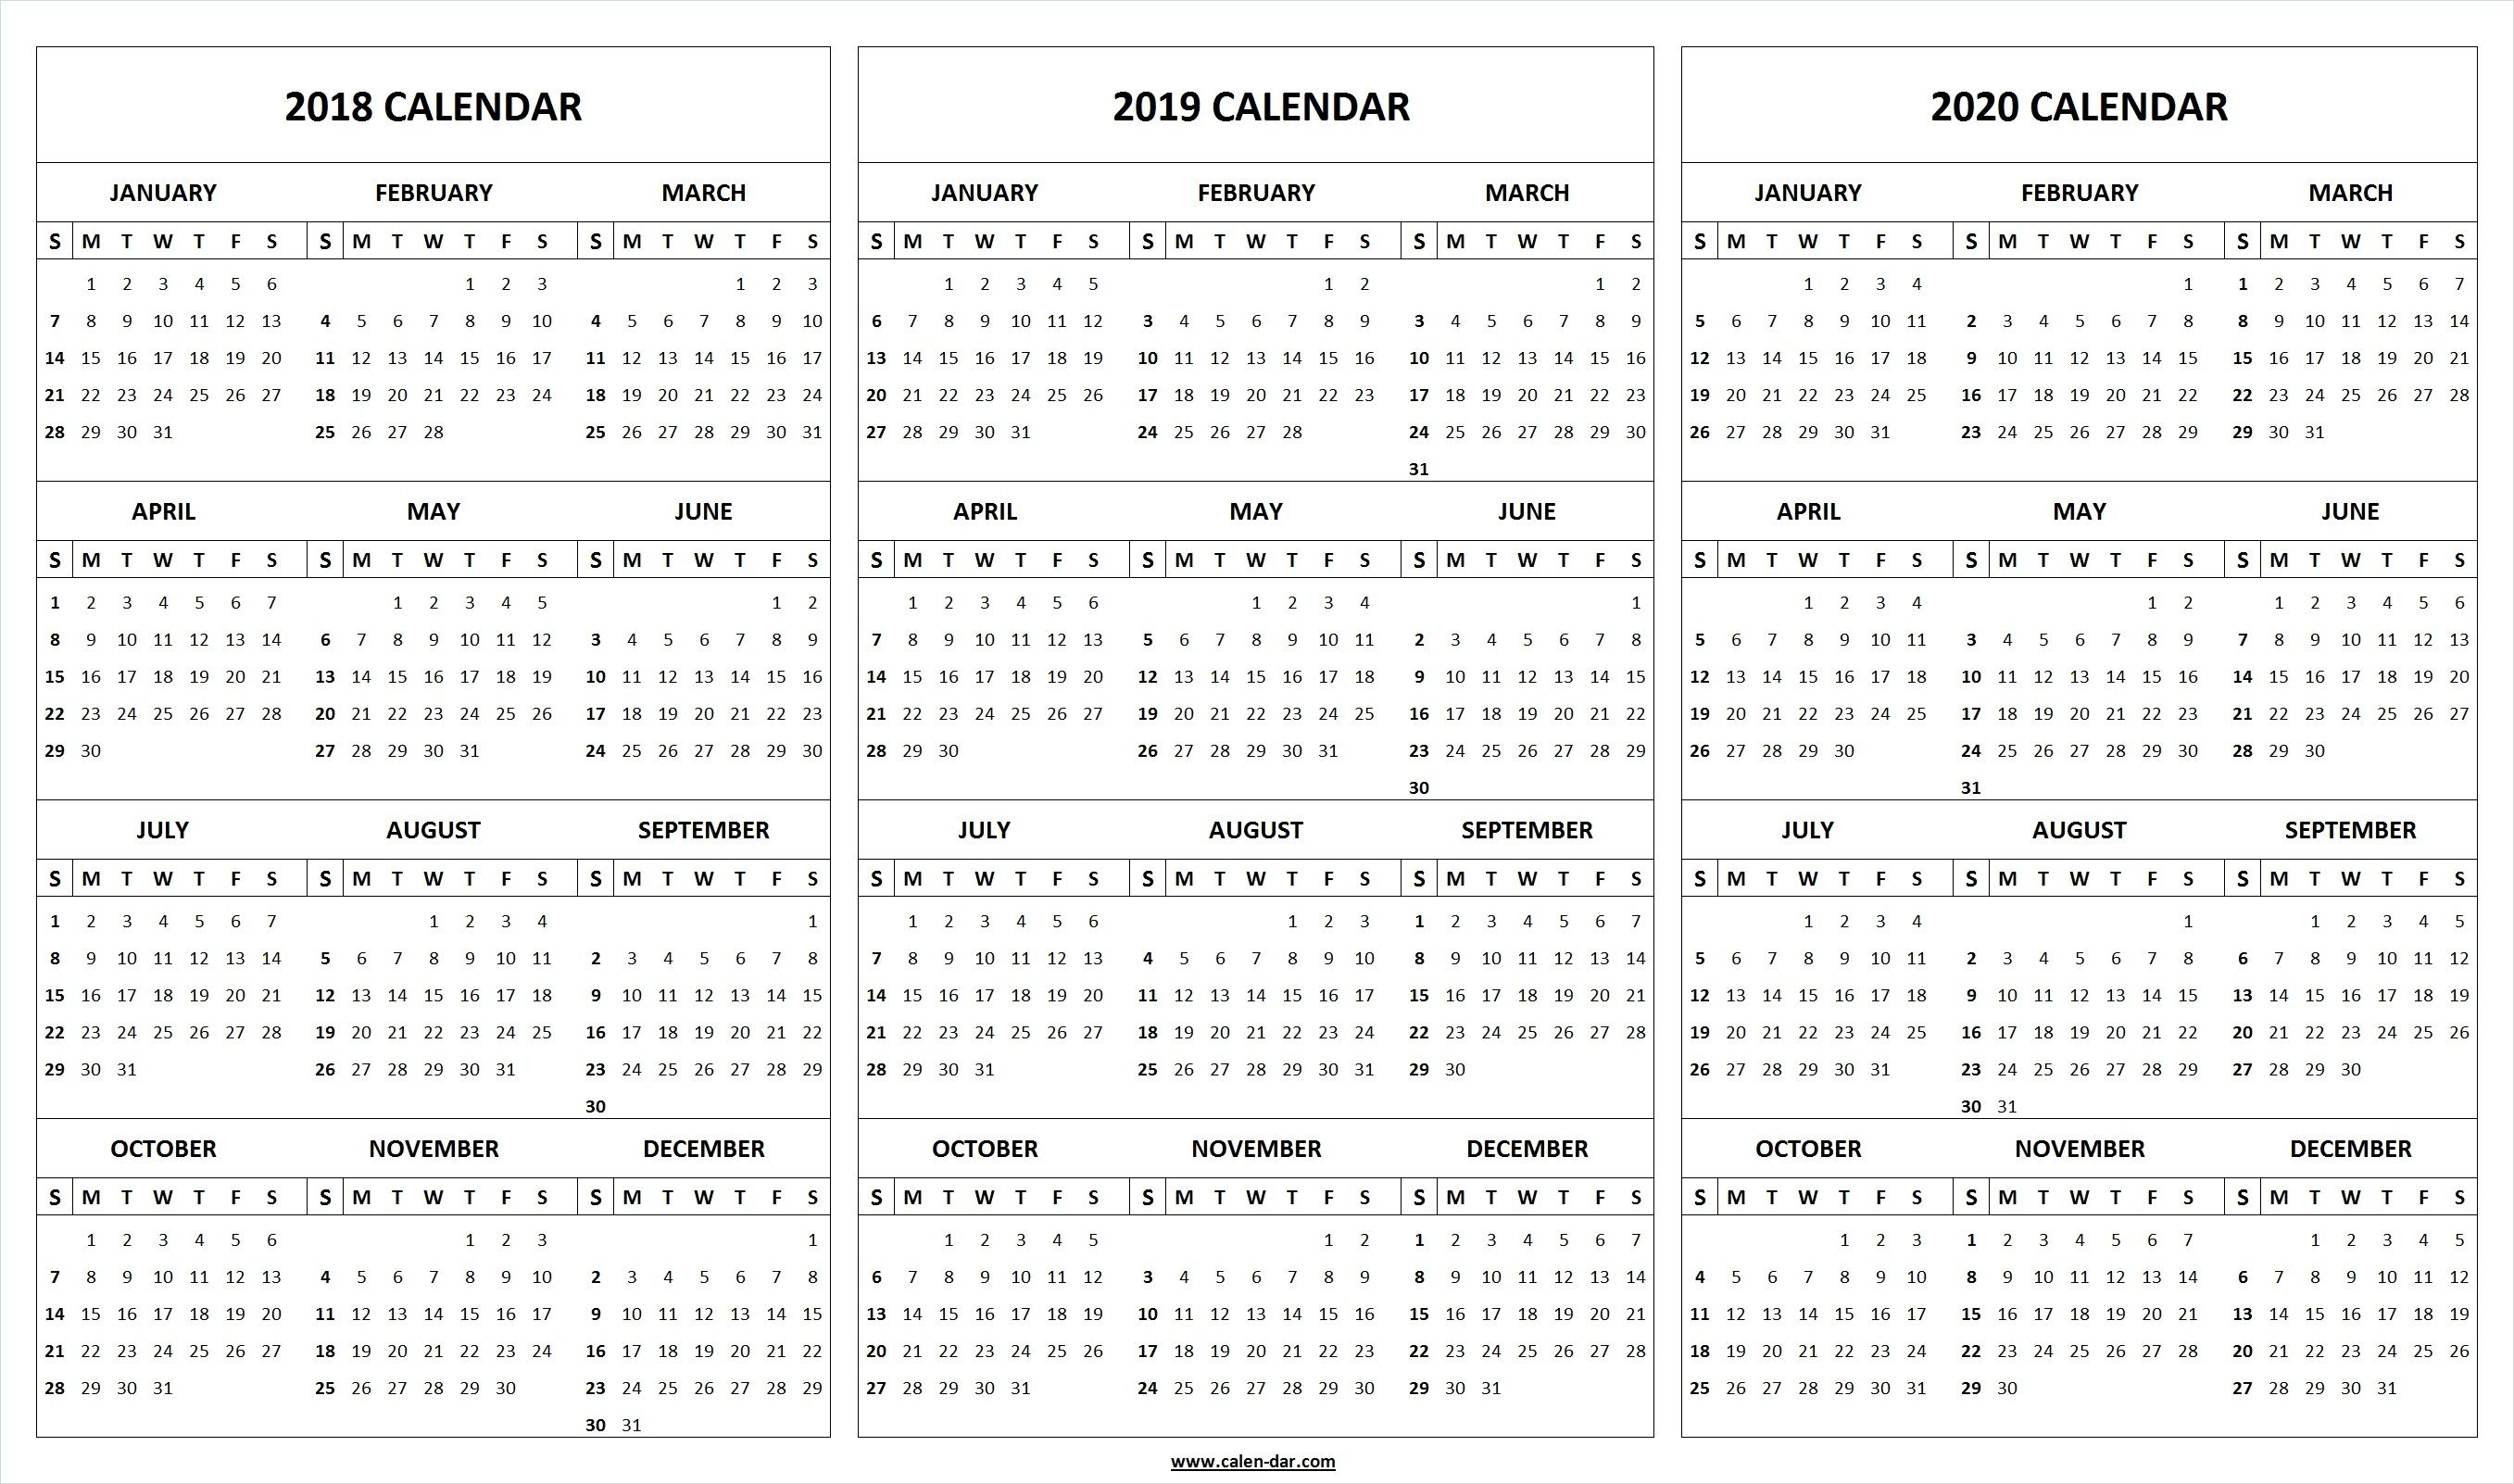 Print Blank 2018 2019 2020 Calendar Template   Organize!   Printable for Free Printable Calendar 2019-2020